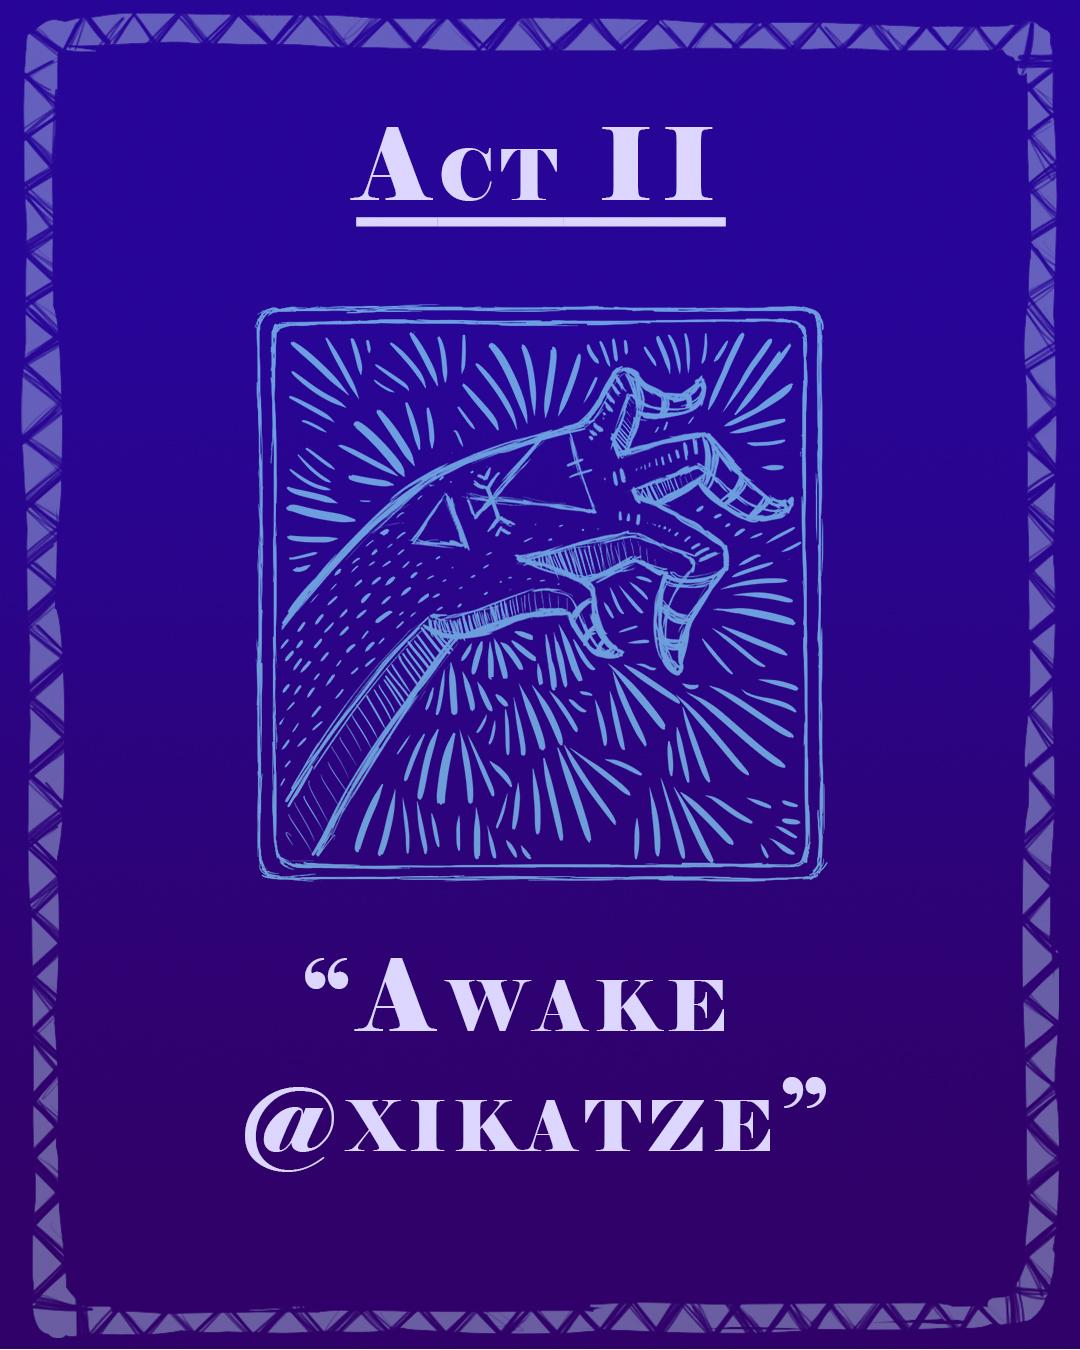 0 awake xi.jpg